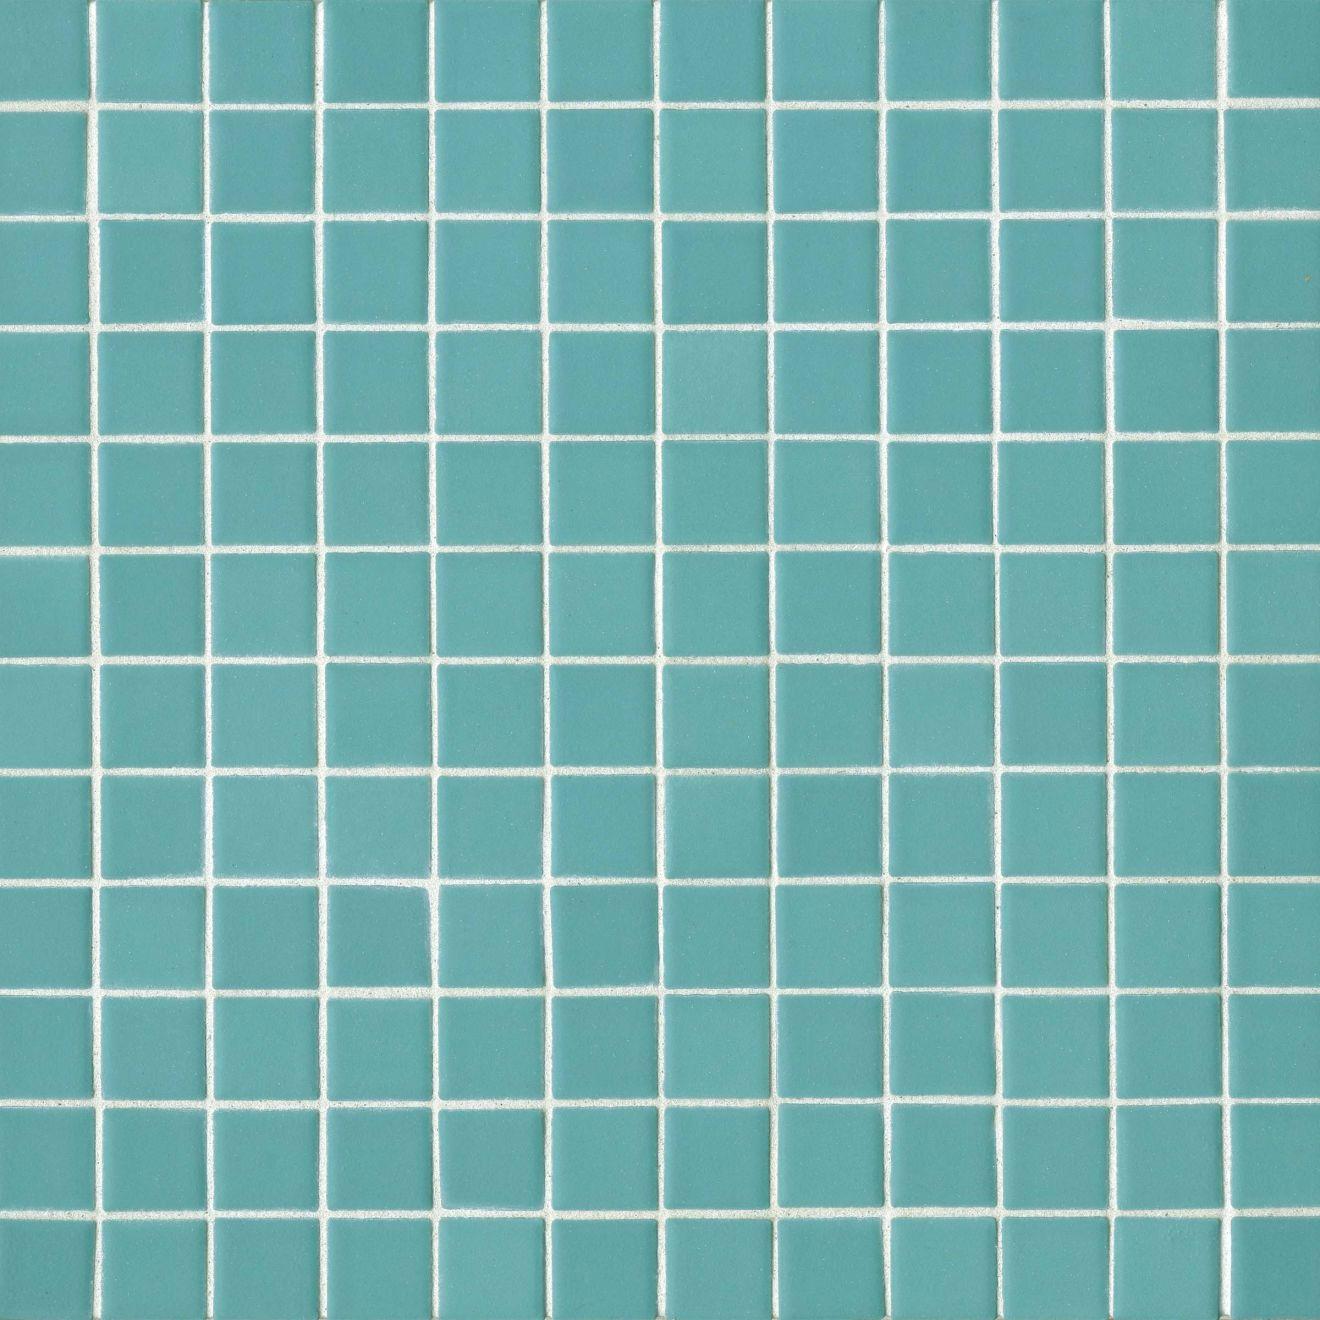 "True 1"" x 1"" Floor & Wall Mosaic in Aqua"